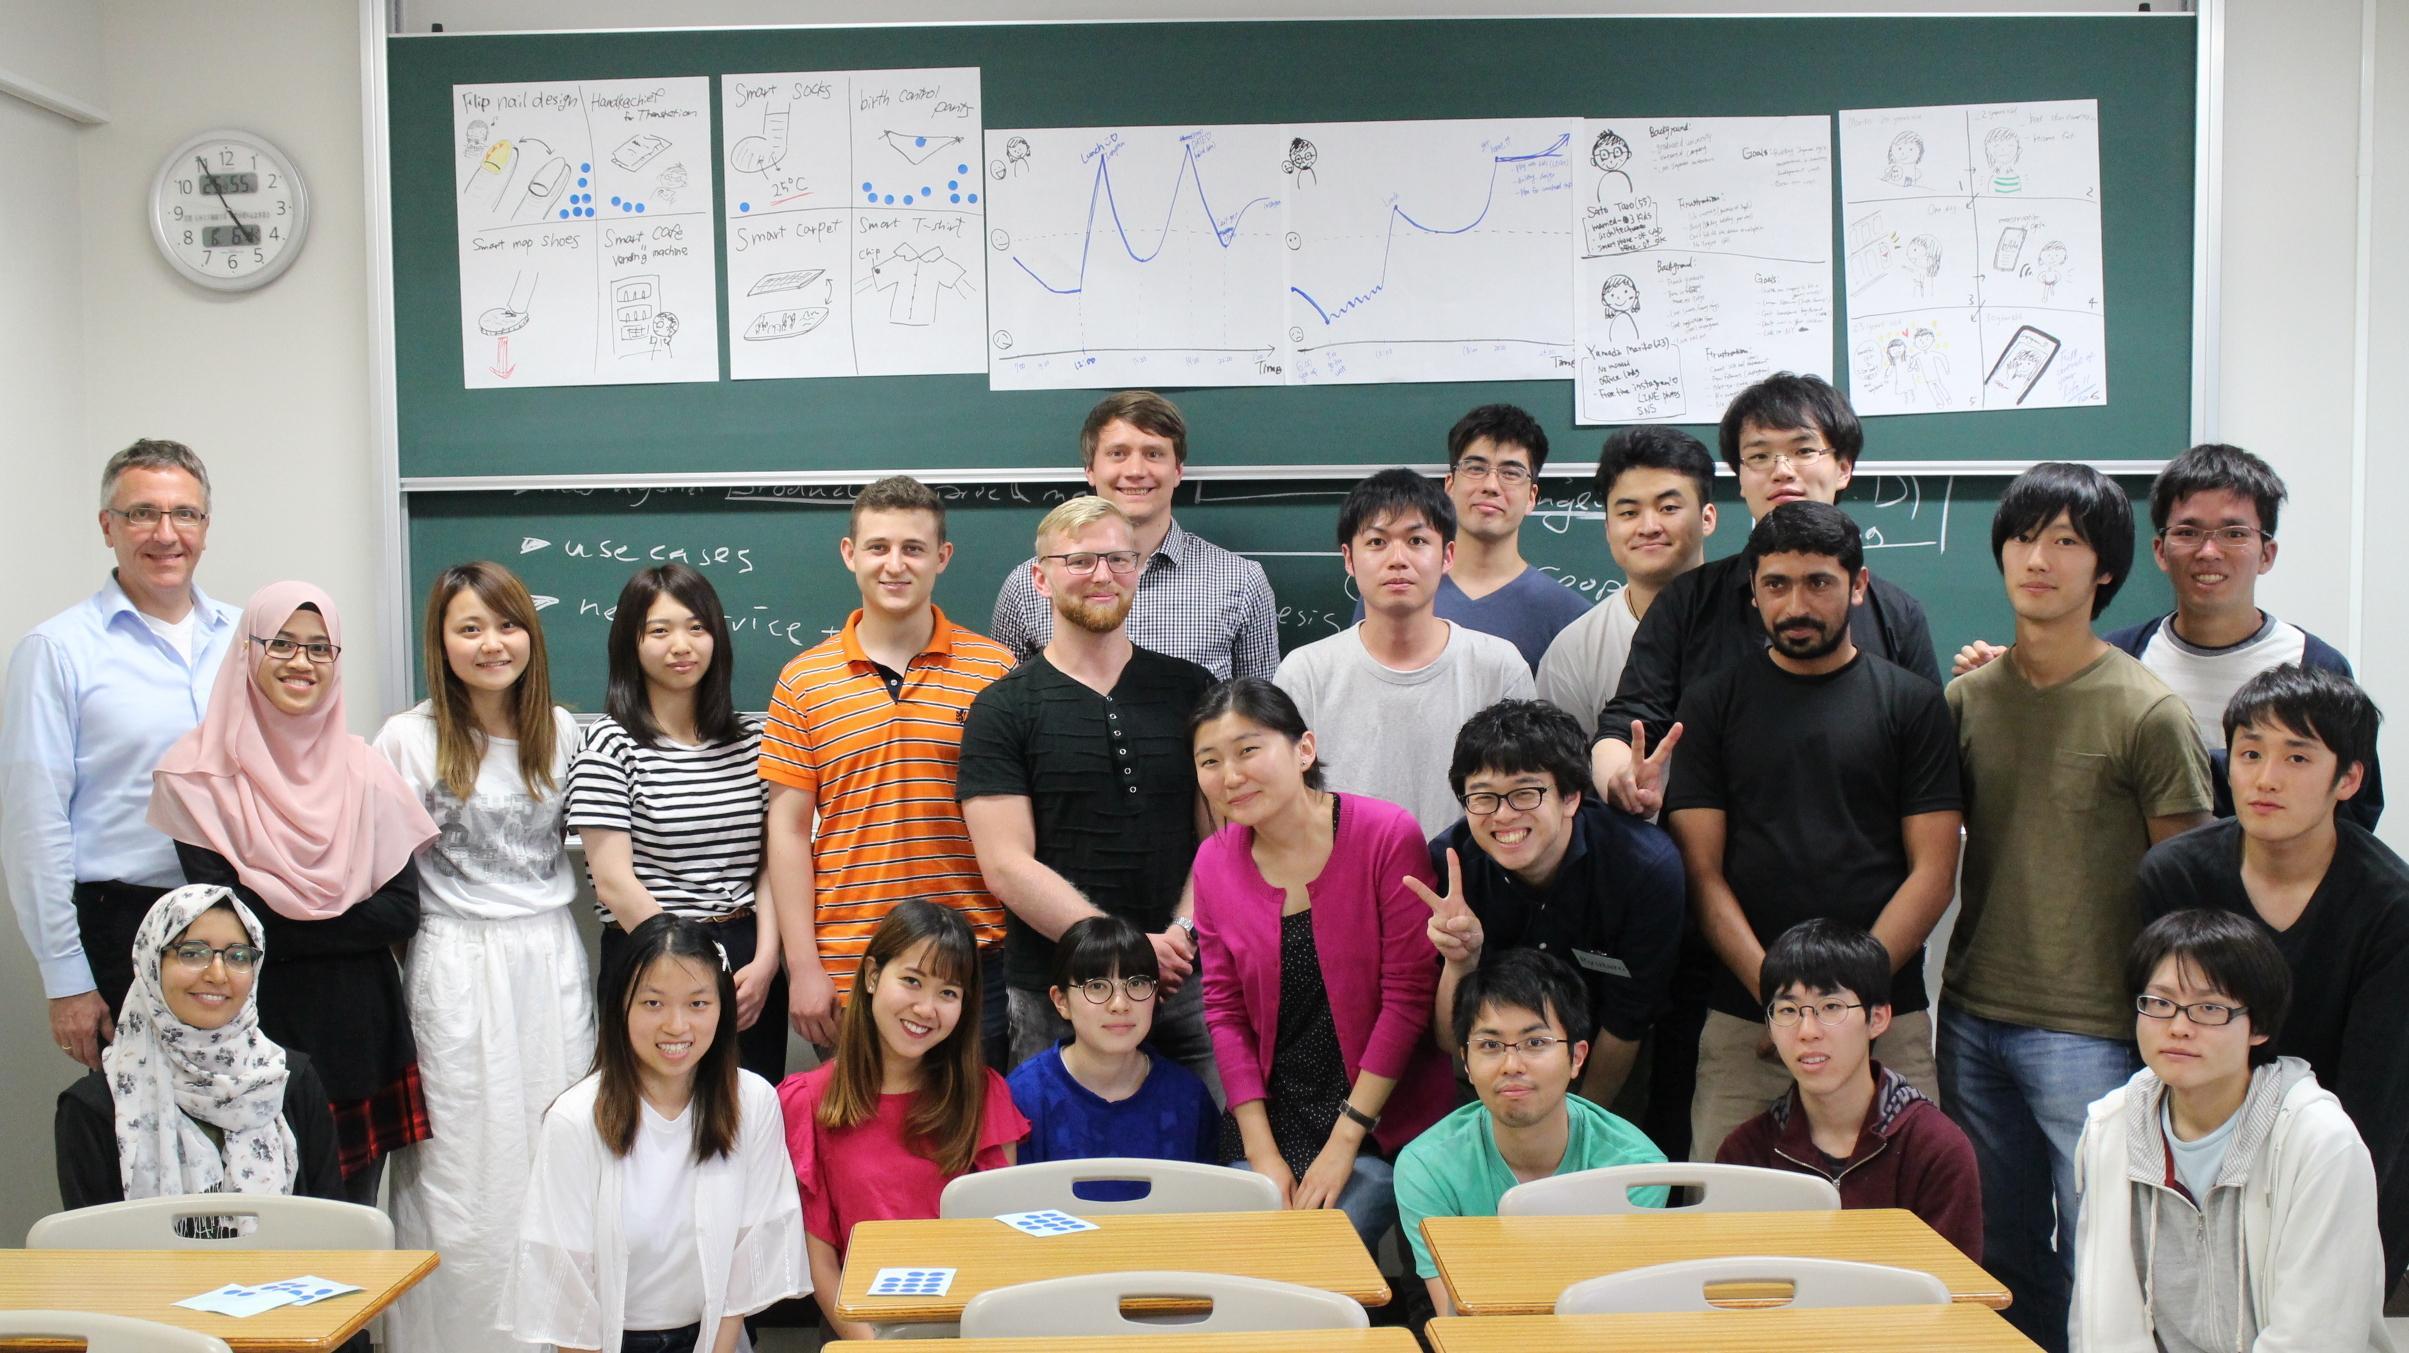 http://www.shinshu-u.ac.jp/project/leading/news/Prof.Gries201806-2.JPG